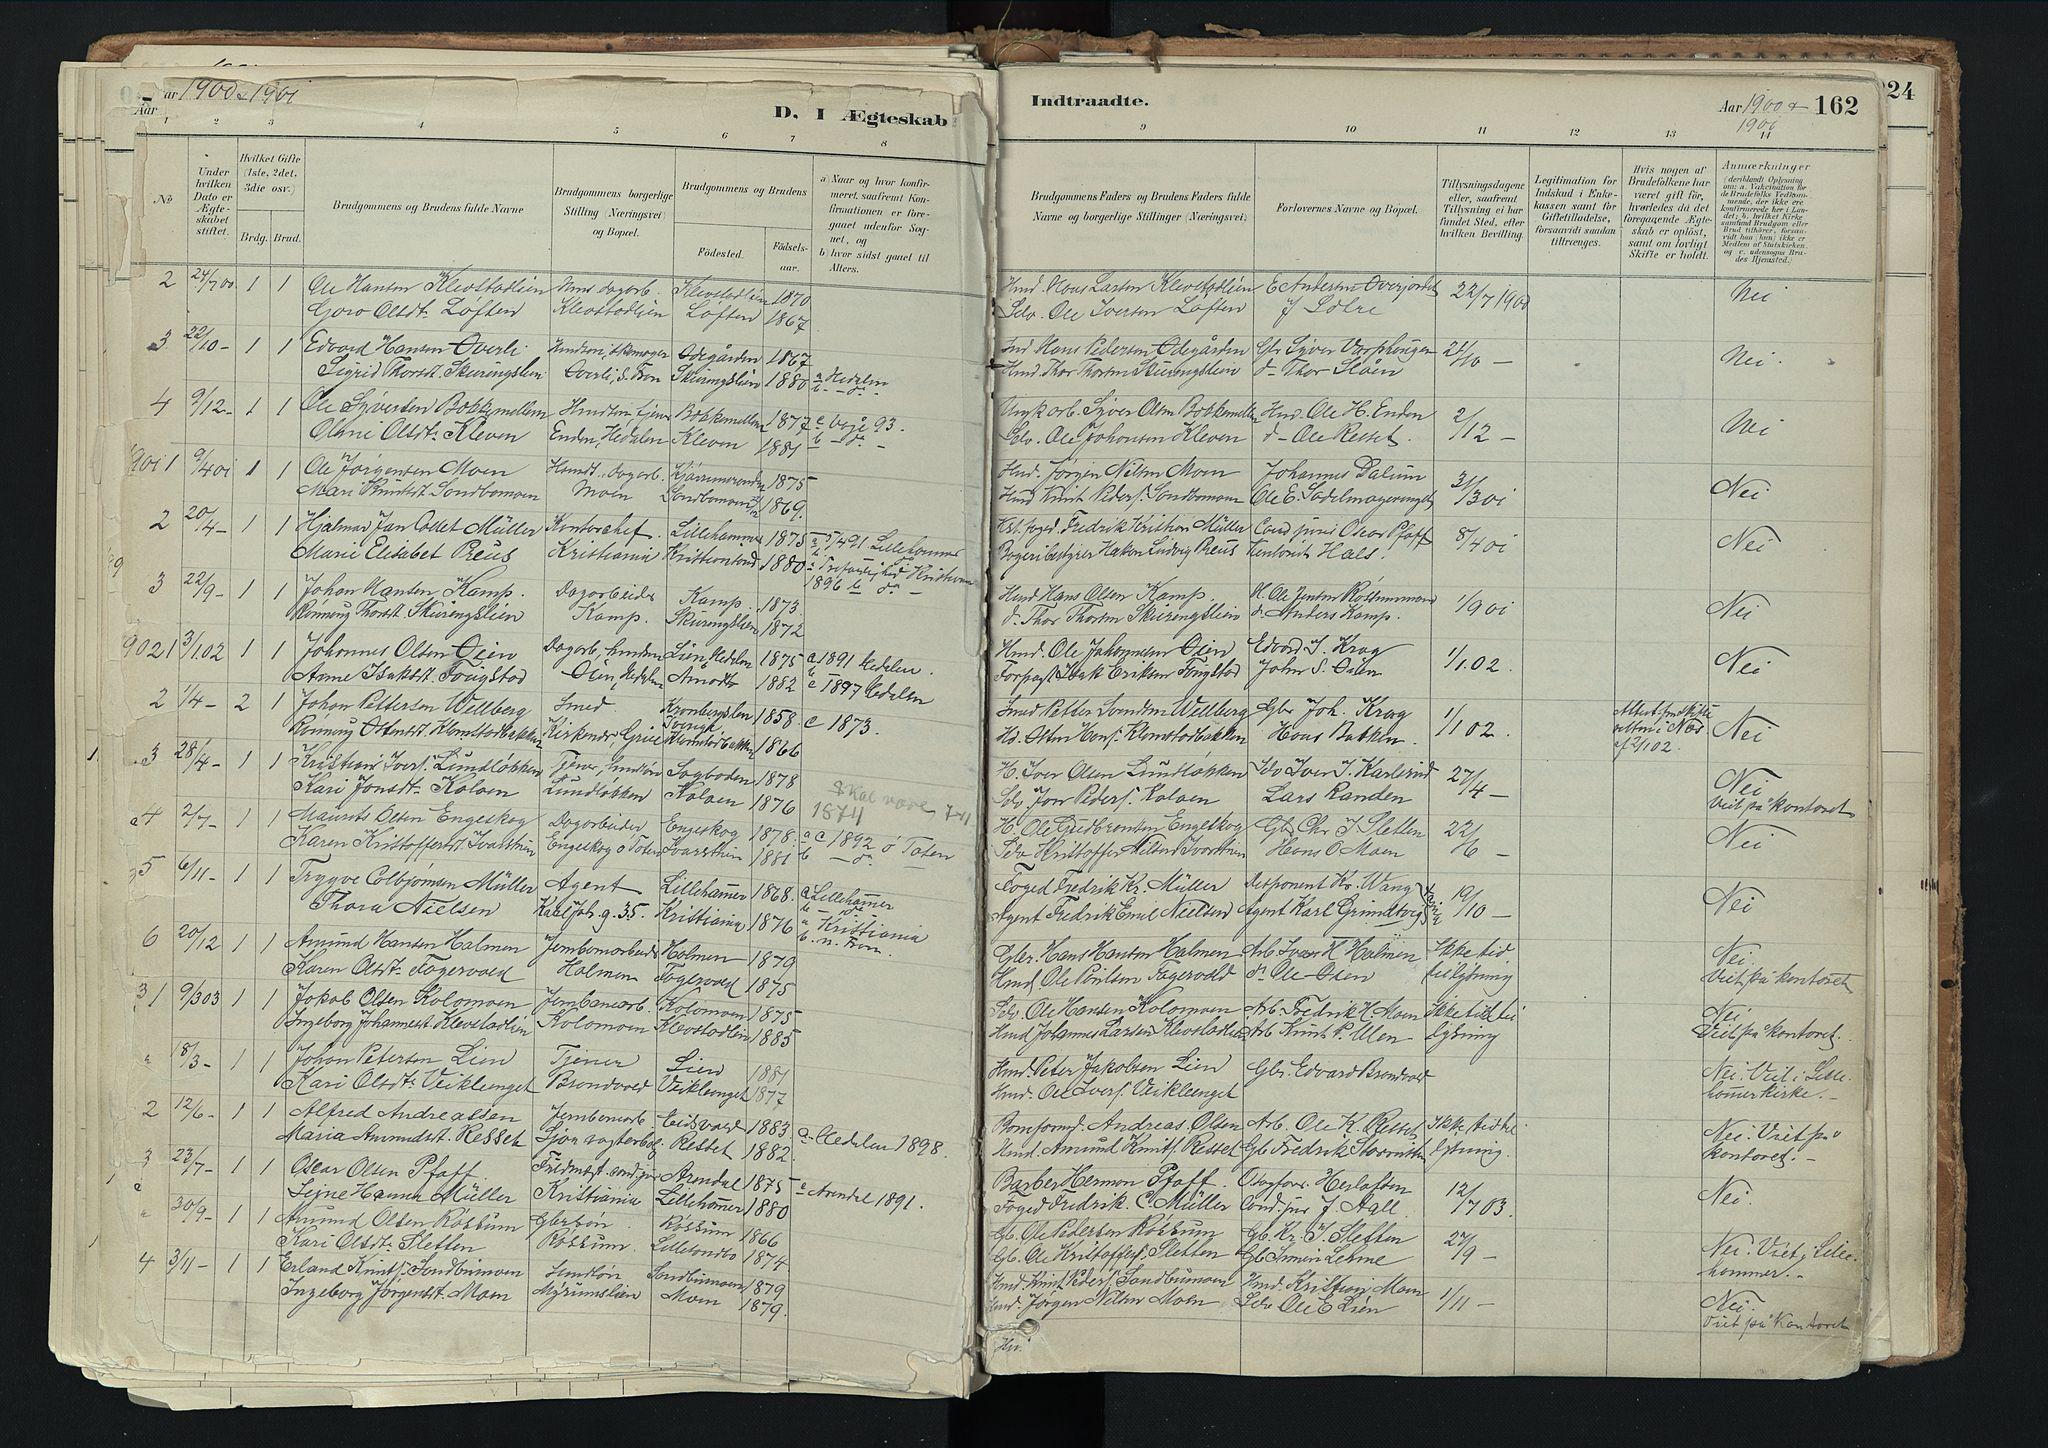 SAH, Nord-Fron prestekontor, Ministerialbok nr. 3, 1884-1914, s. 162